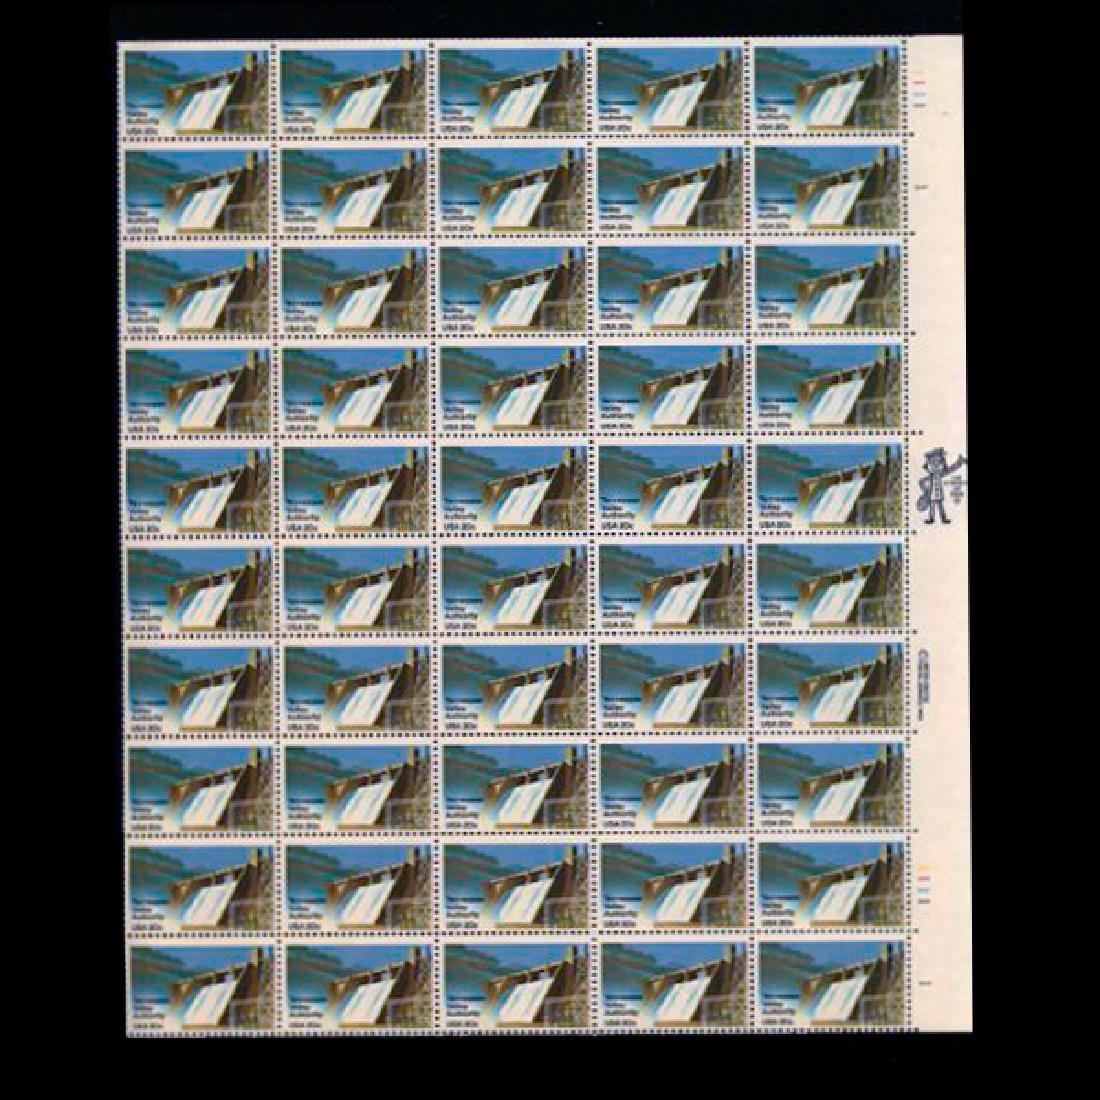 1983 US Sheet 20c TVA Stamps MNH Error RARE